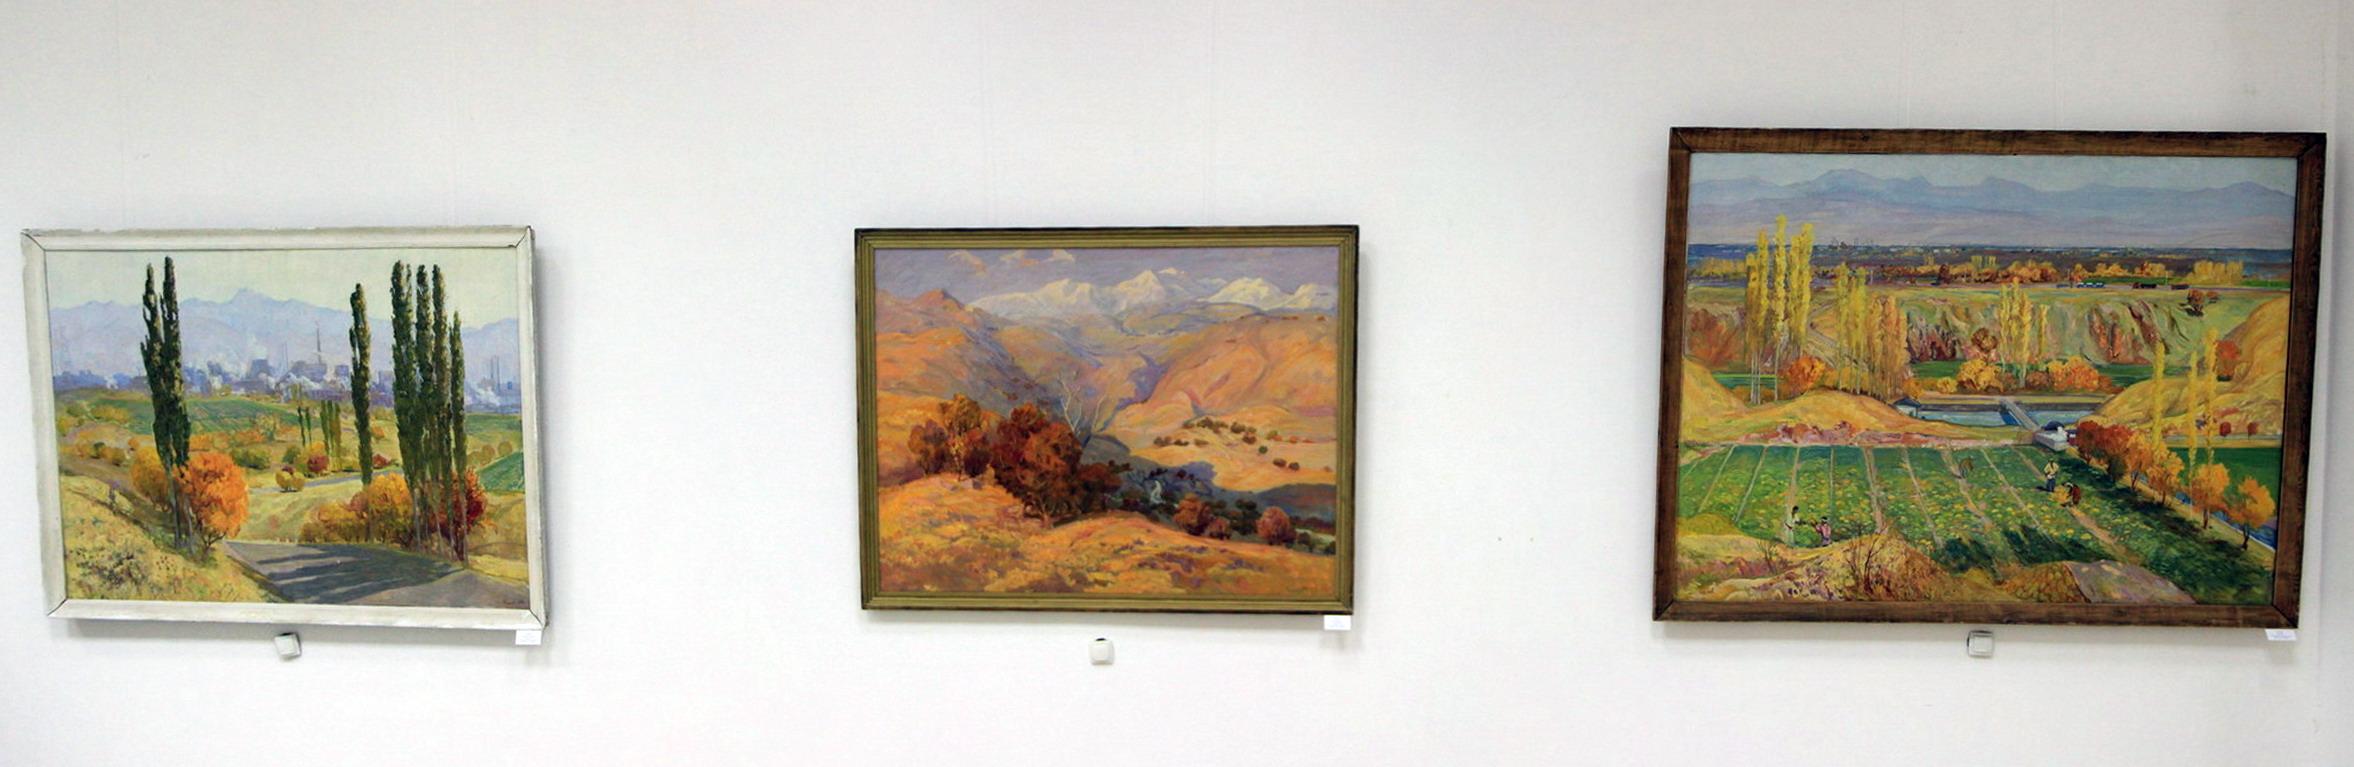 Тахиров П. Экспозиция картин. 08. 2018